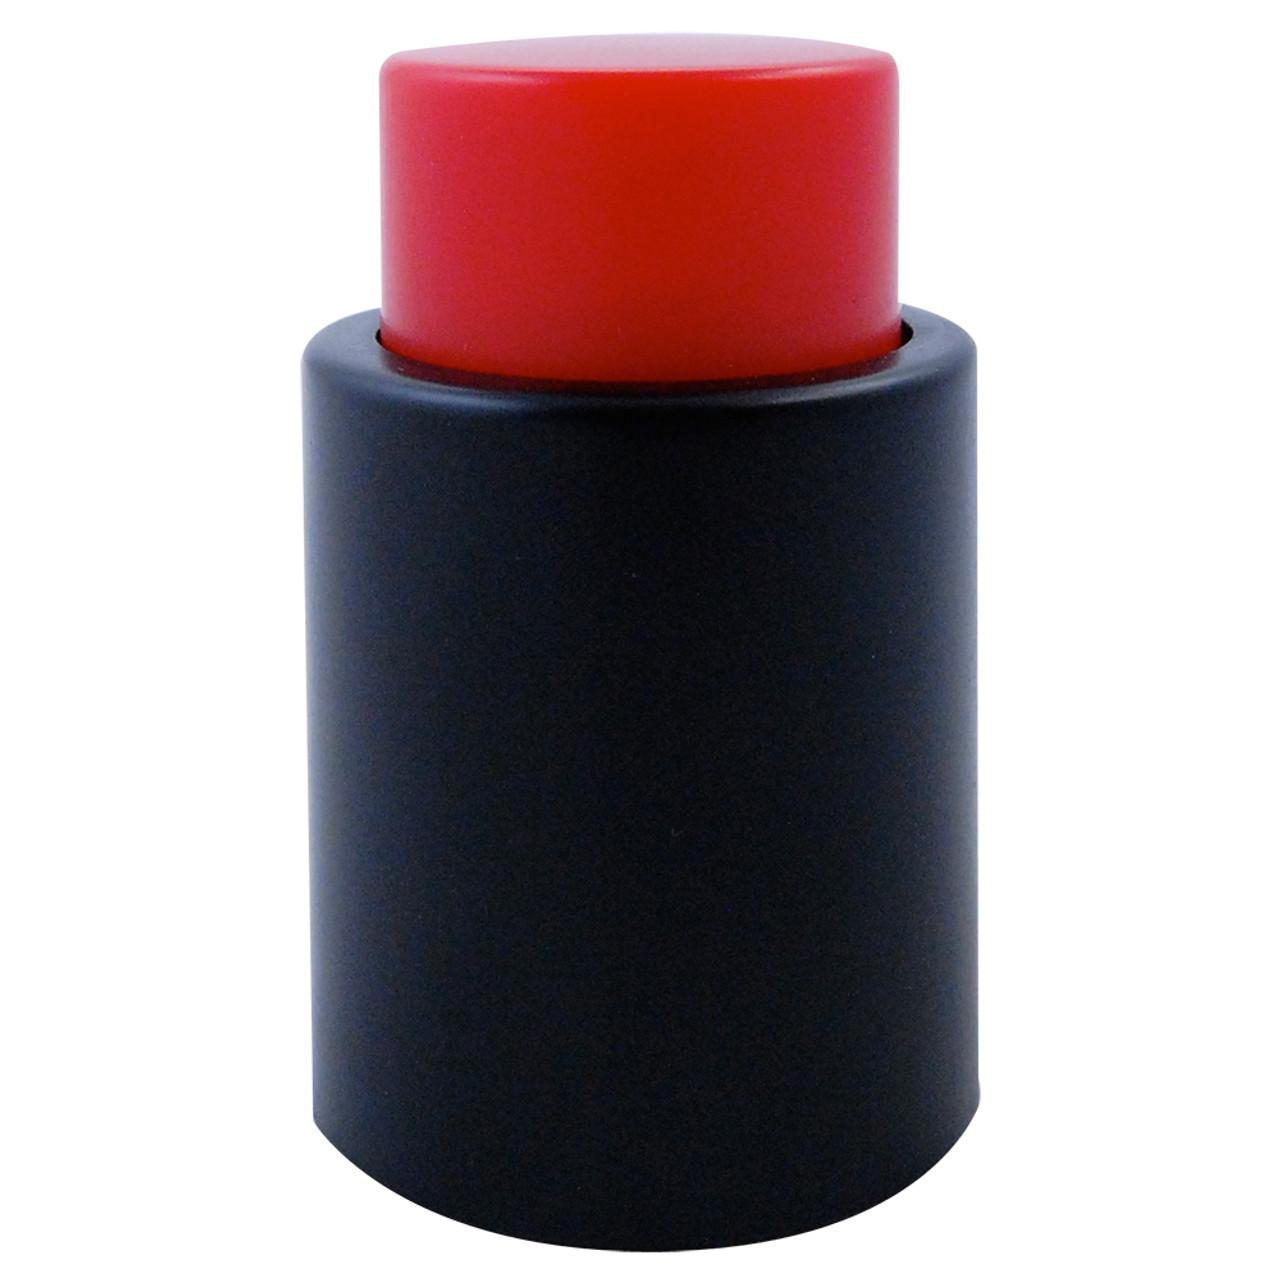 2 in 1 Bottle Stopper & Vacuum Pump